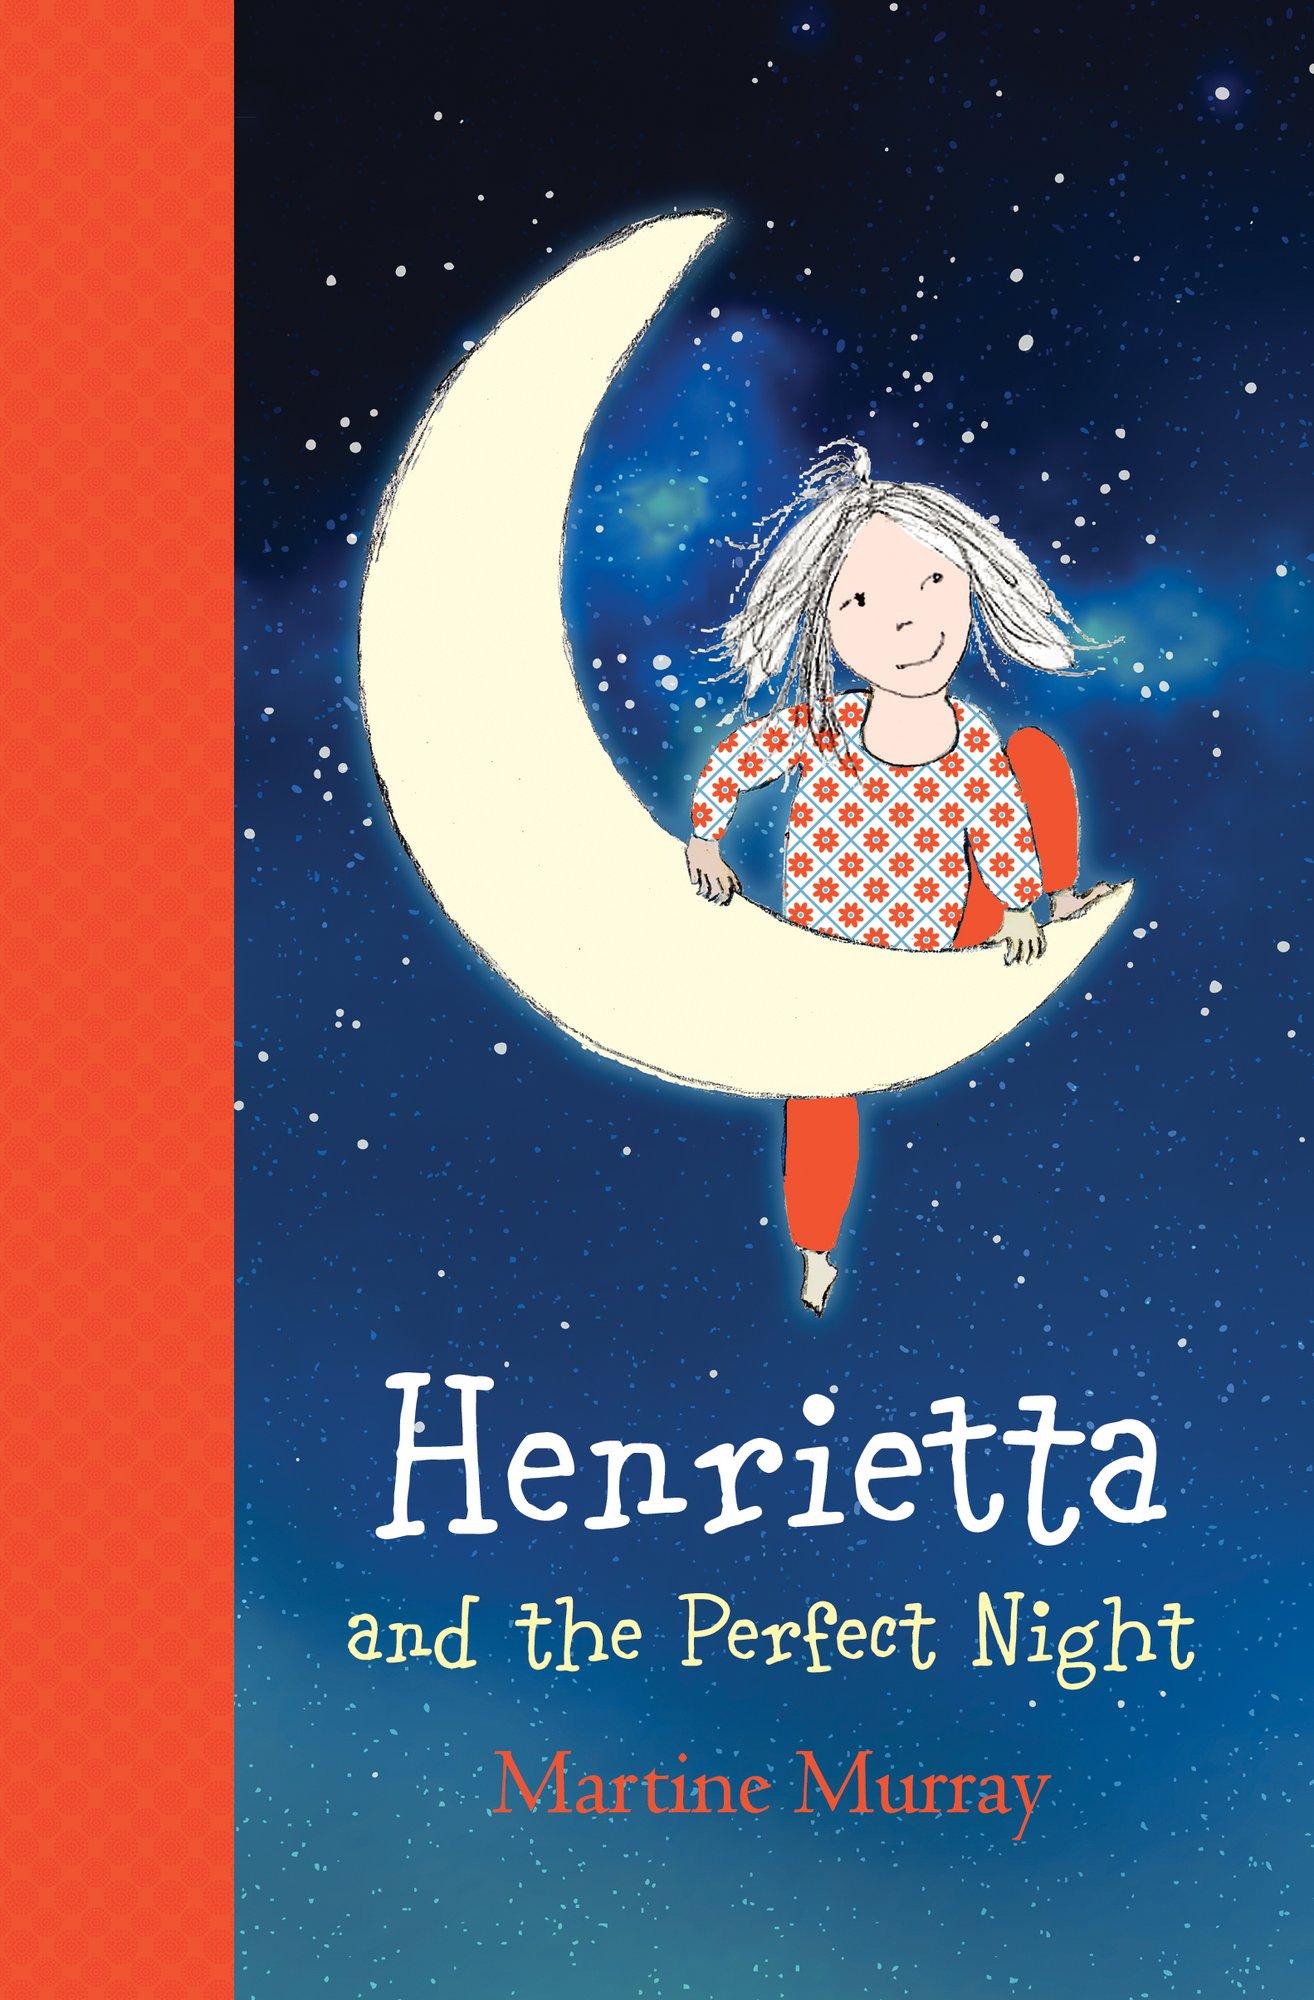 henrietta and the perfect night.jpg